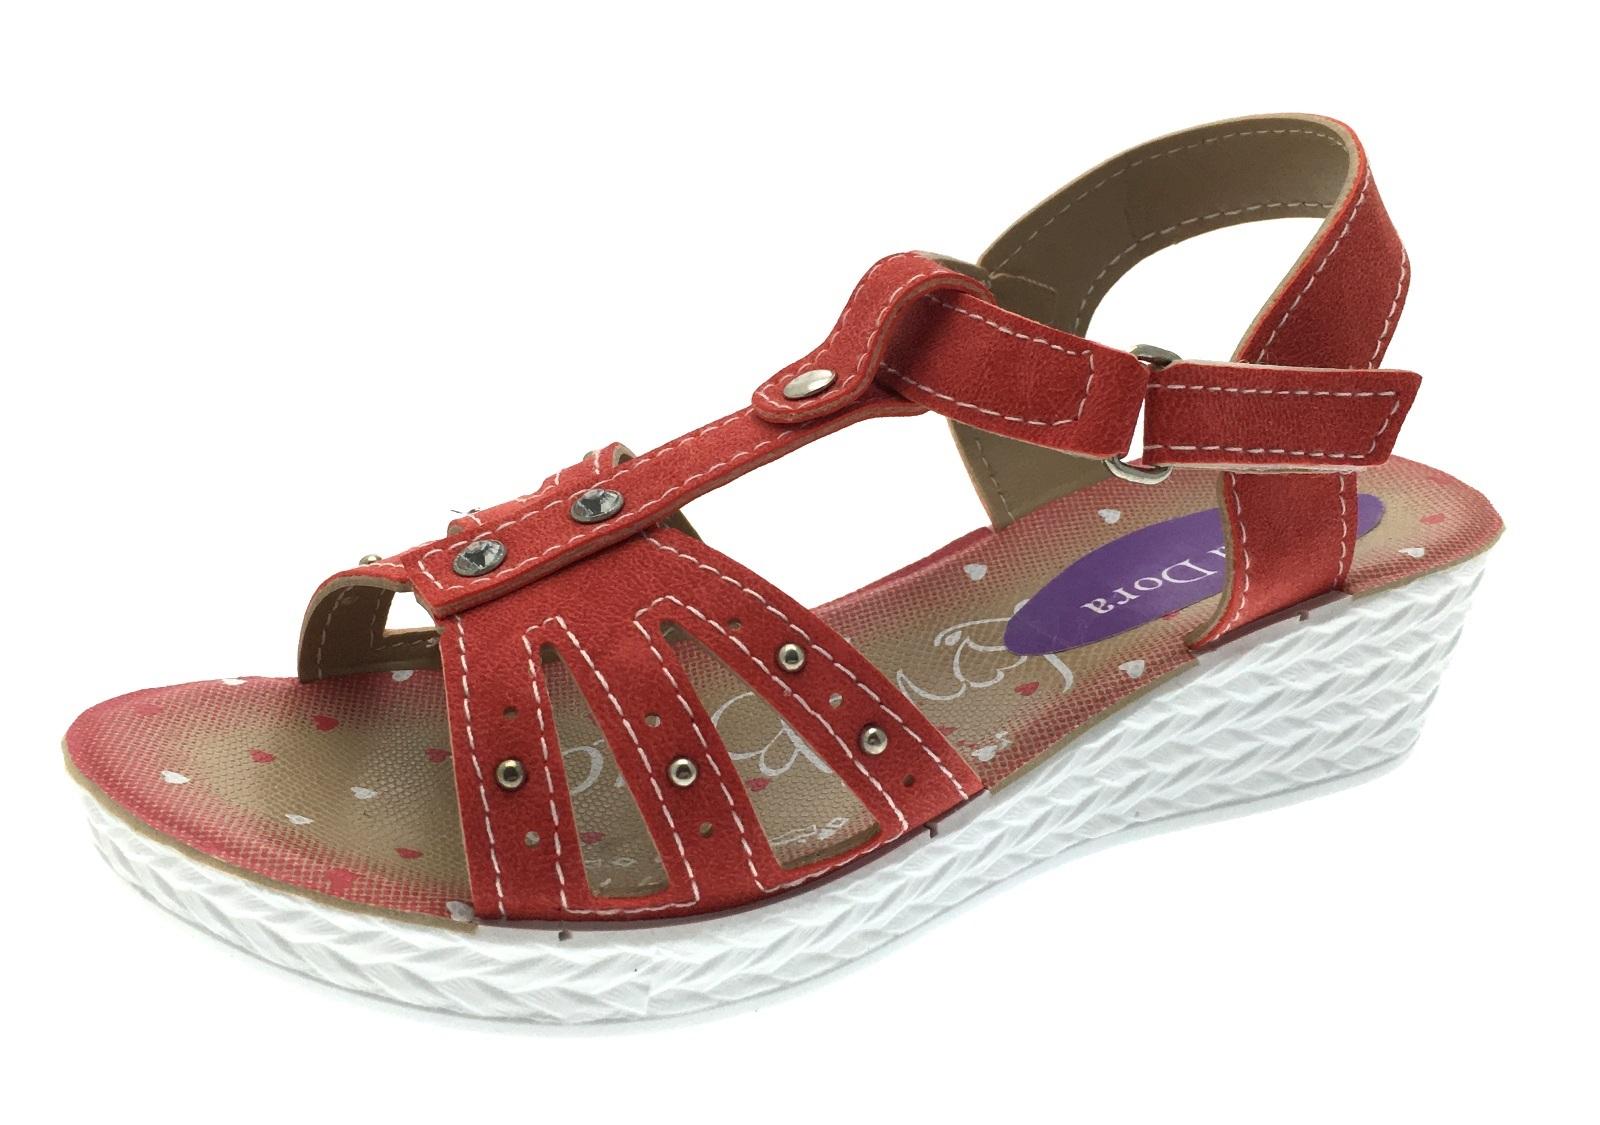 Girls sandals - Girls Sandals Adjustable Strap Low Wedge Party Shoes Flower T Bar Wedges Kids